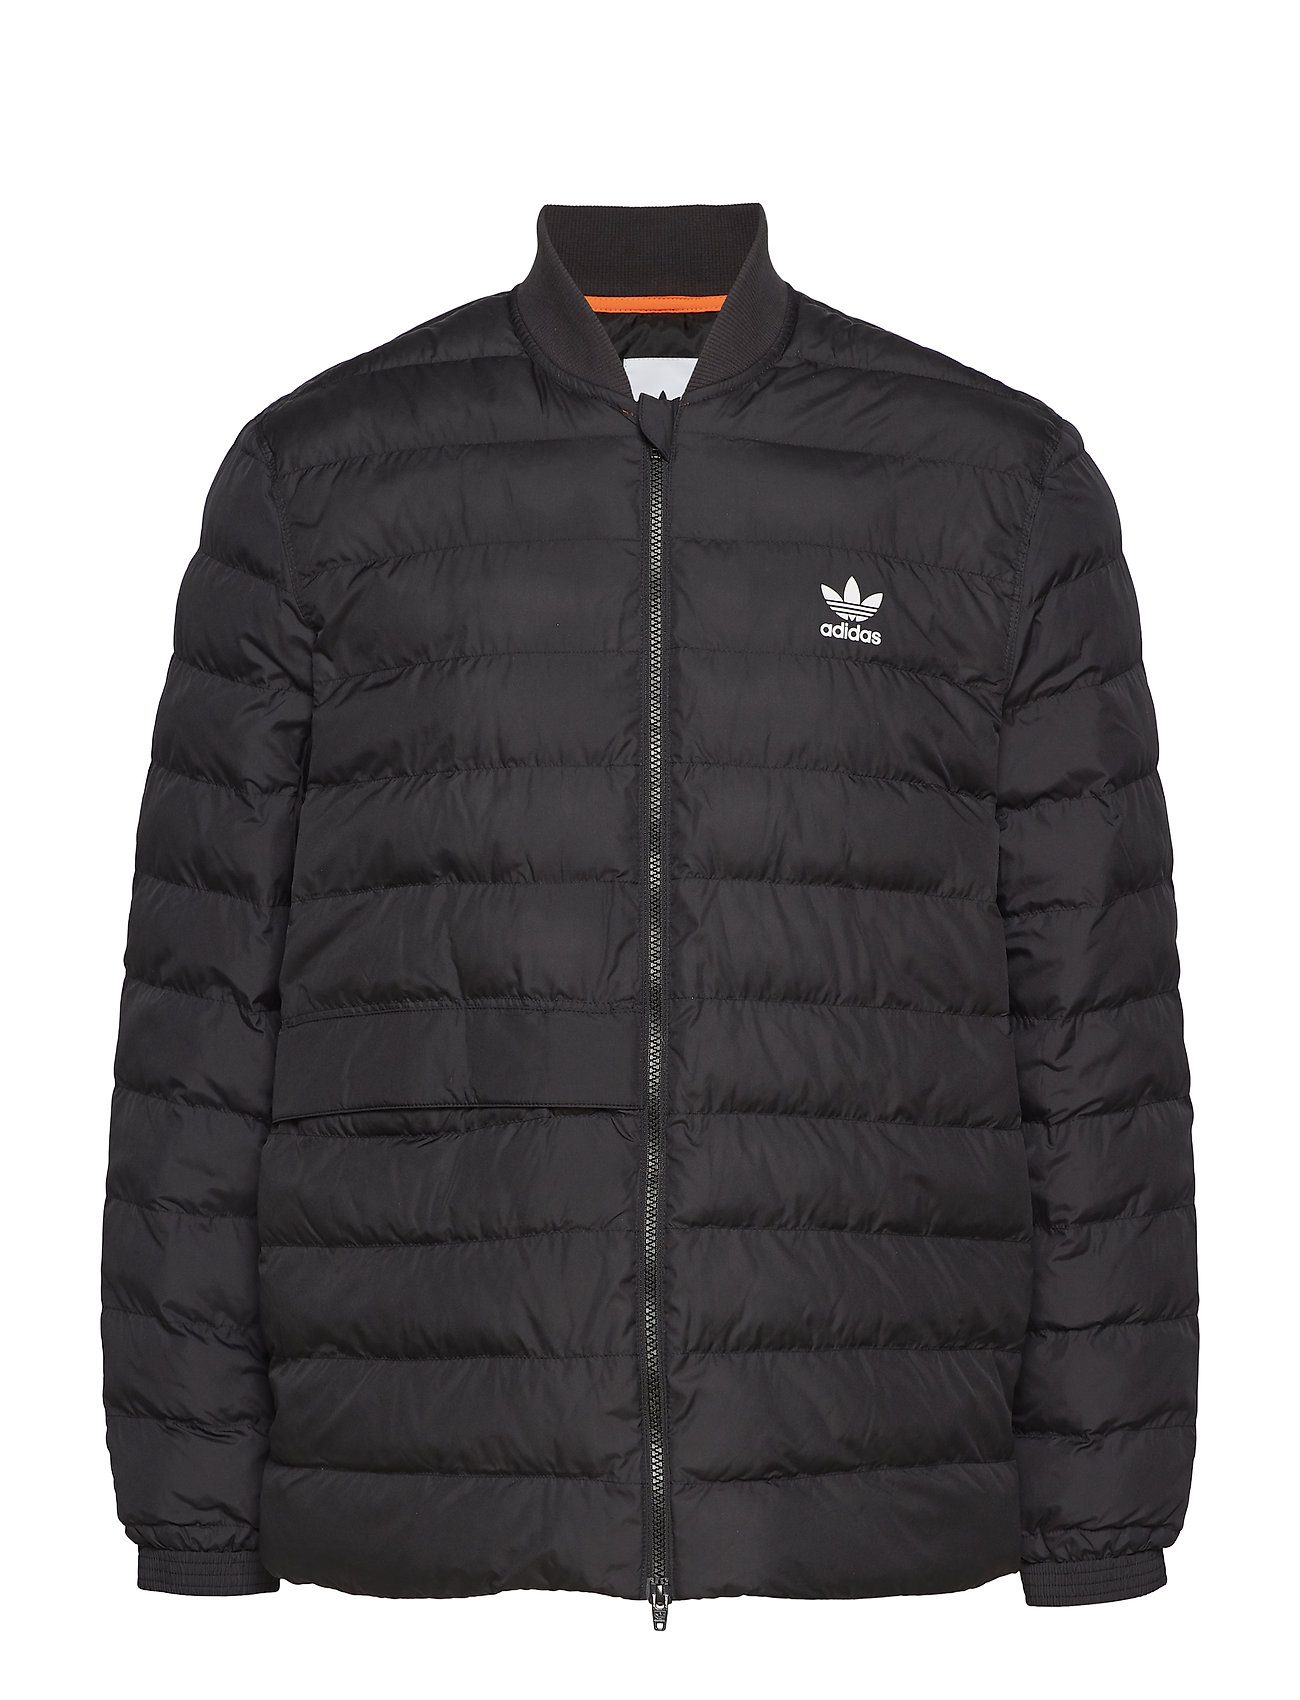 adidas Originals SST OUTDOOR - BLACK